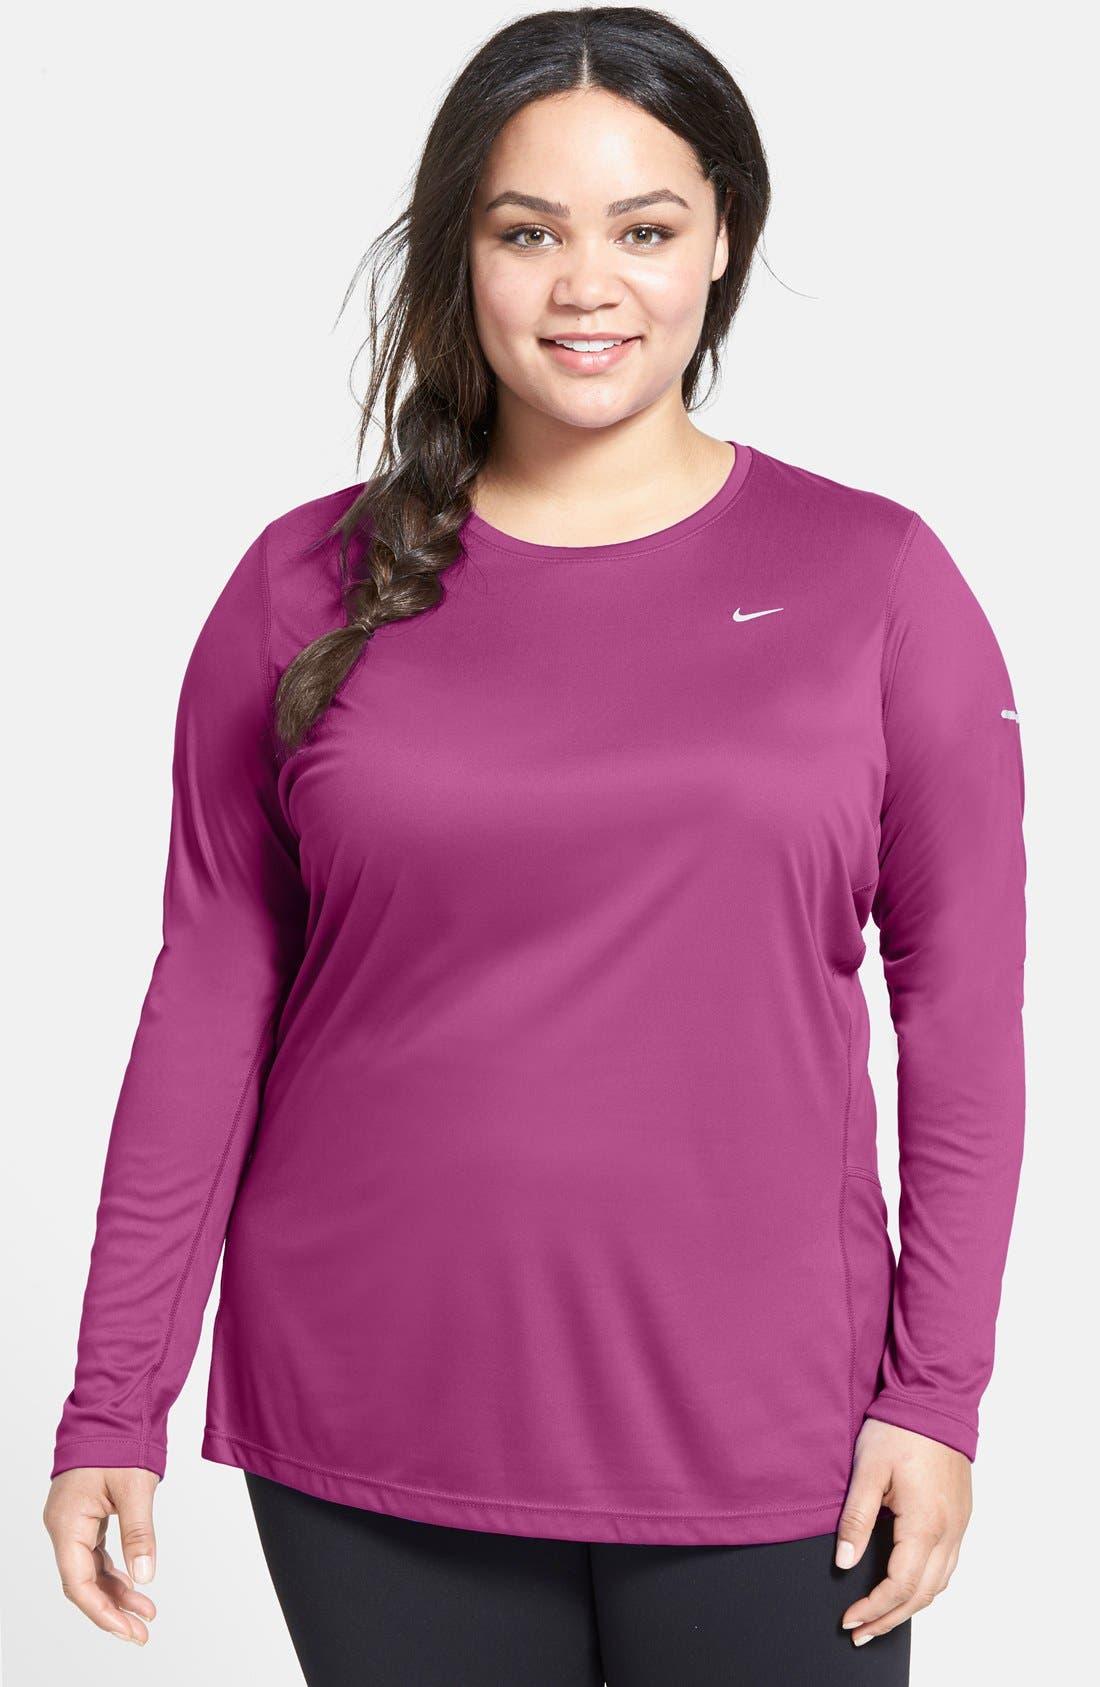 Alternate Image 1 Selected - Nike 'Miler' Long Sleeve Dri-FIT Tee (Plus Size)